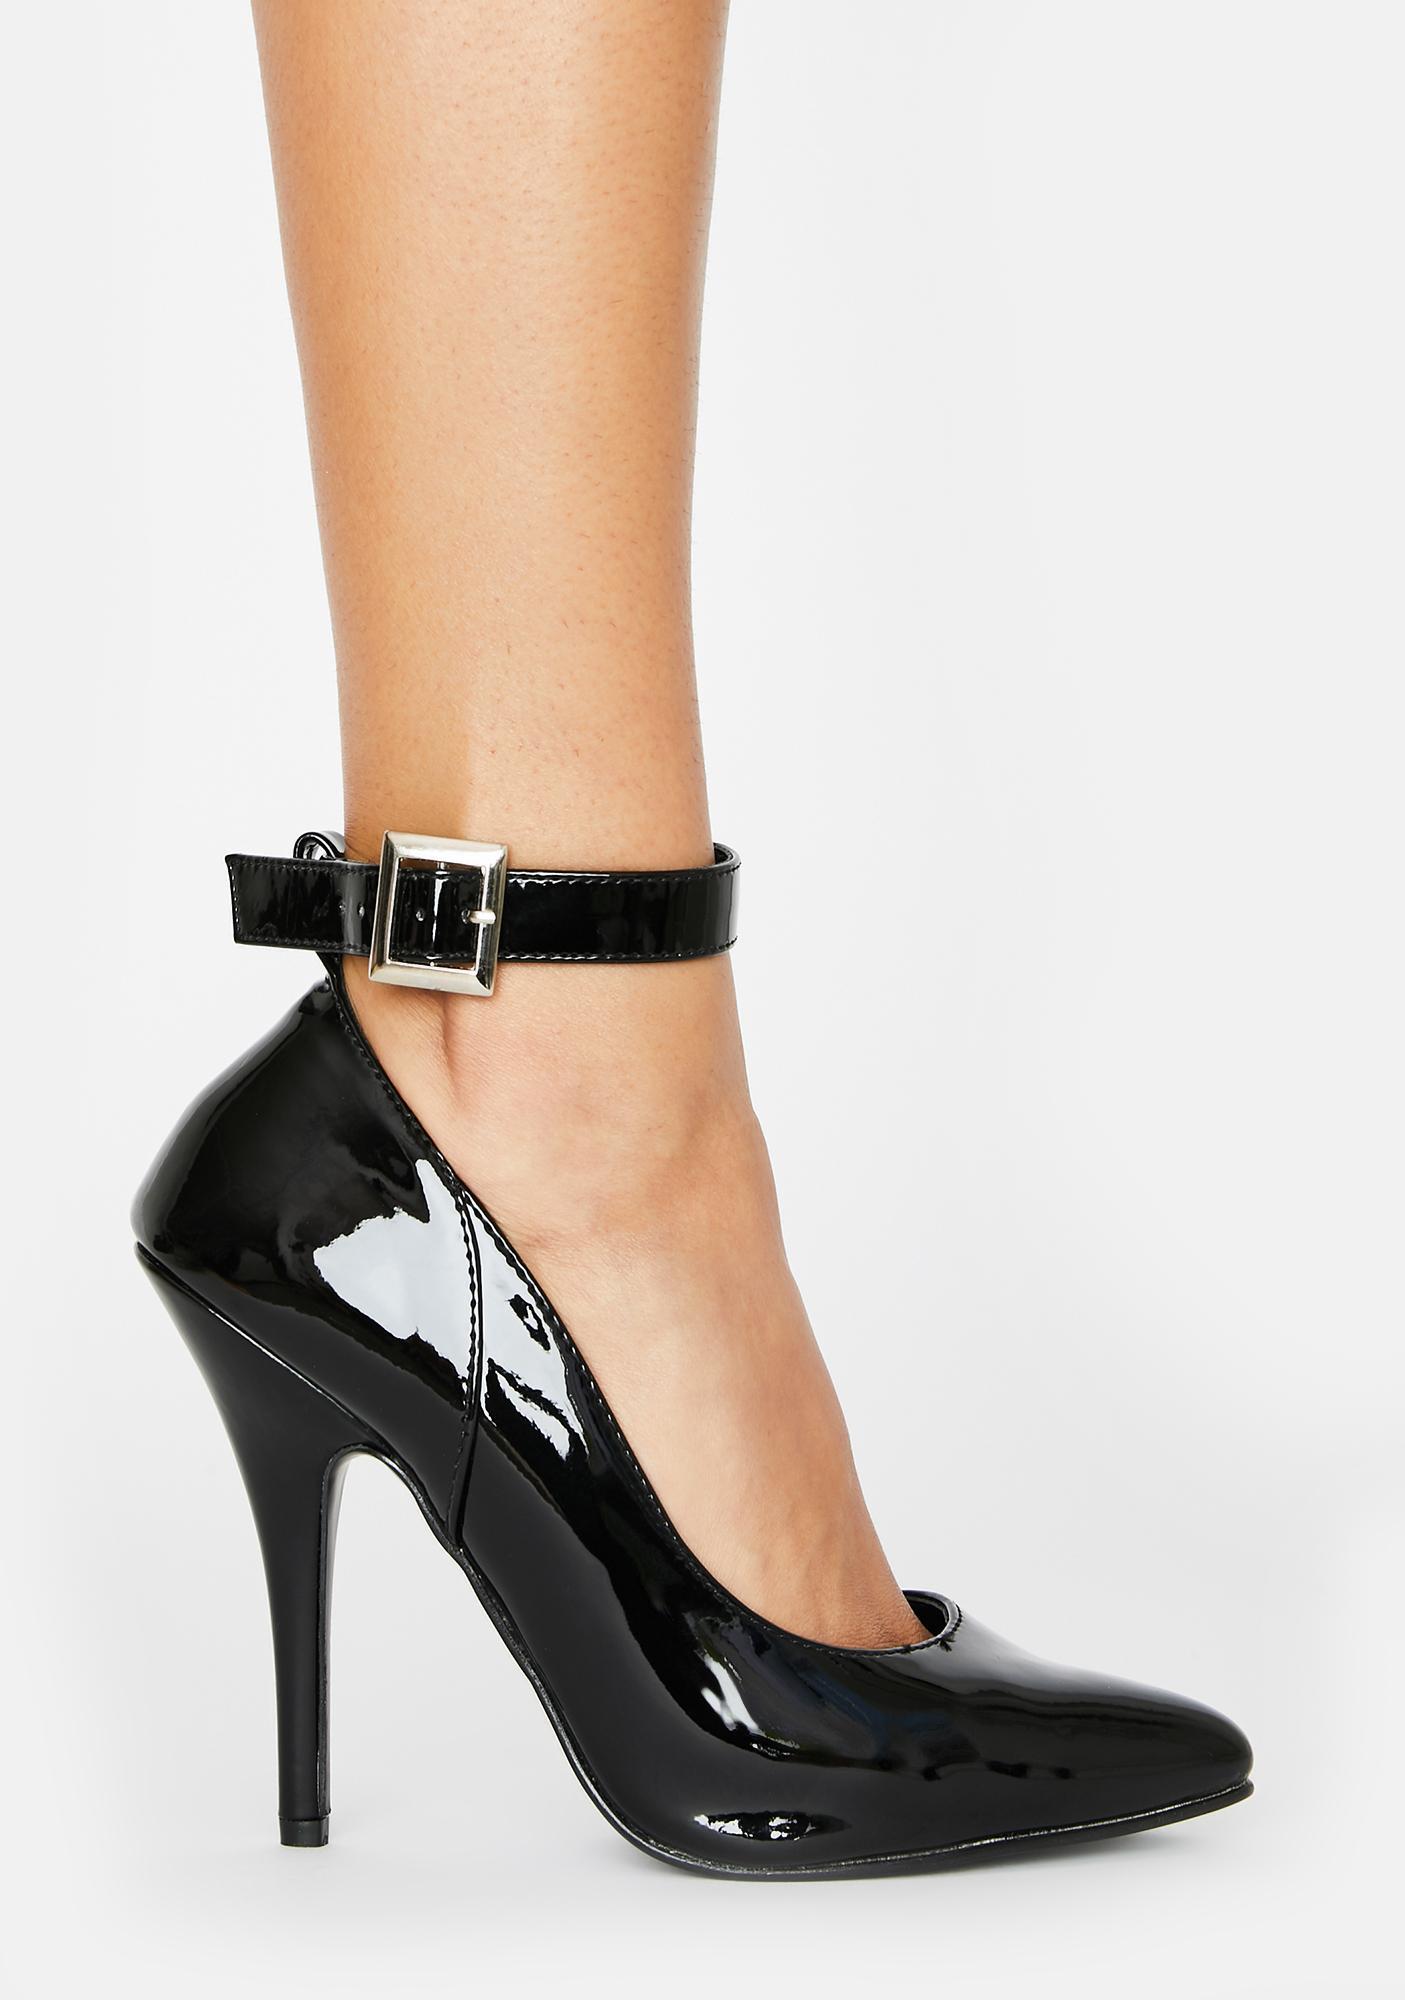 Pleaser Paid To Seduce Stiletto Heels